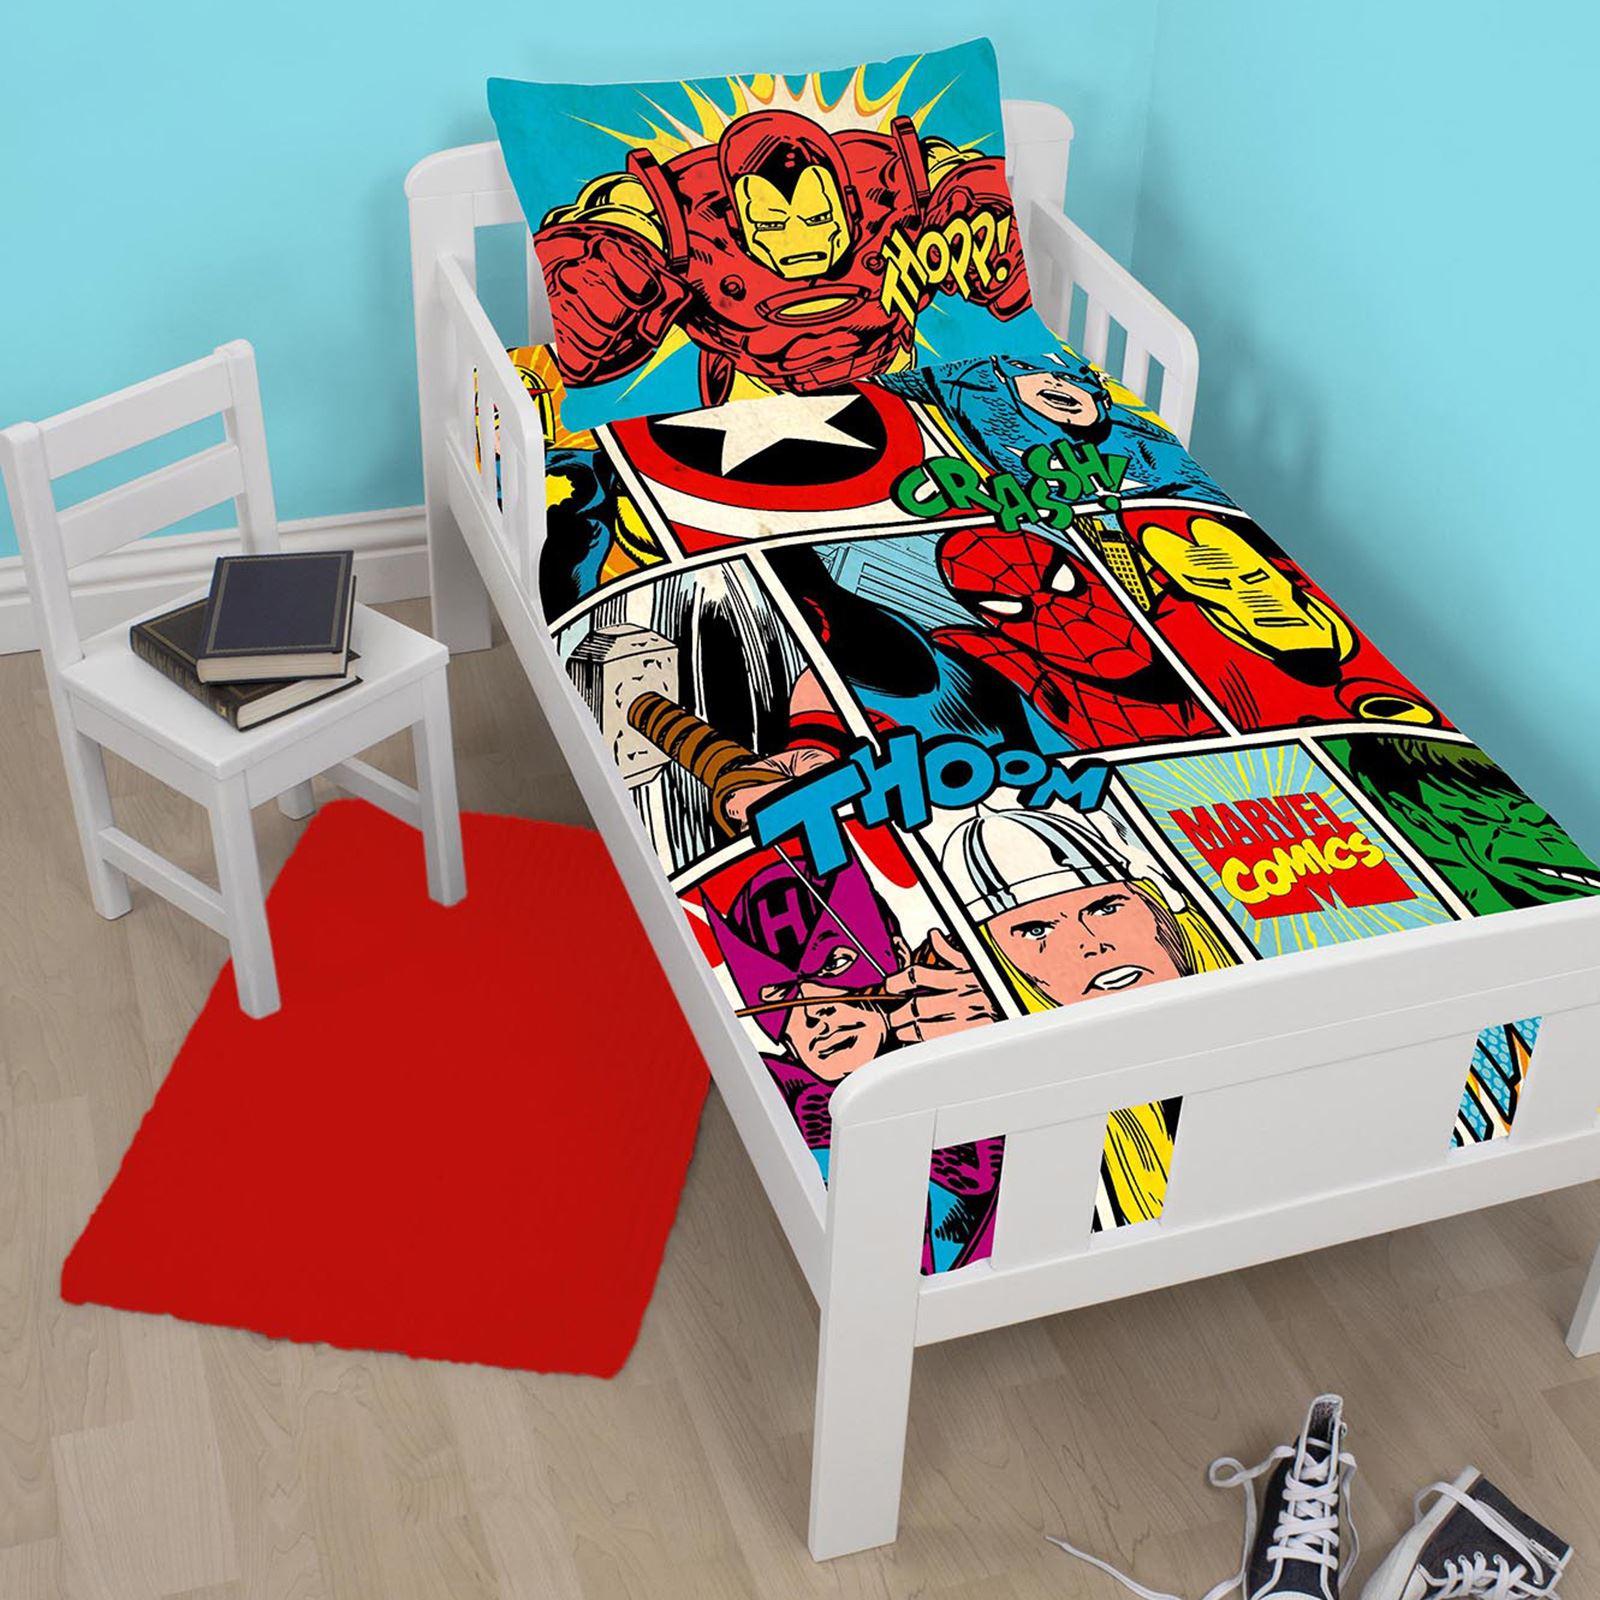 personnage disney lit b b junior housse couette literie sofia cars ebay. Black Bedroom Furniture Sets. Home Design Ideas